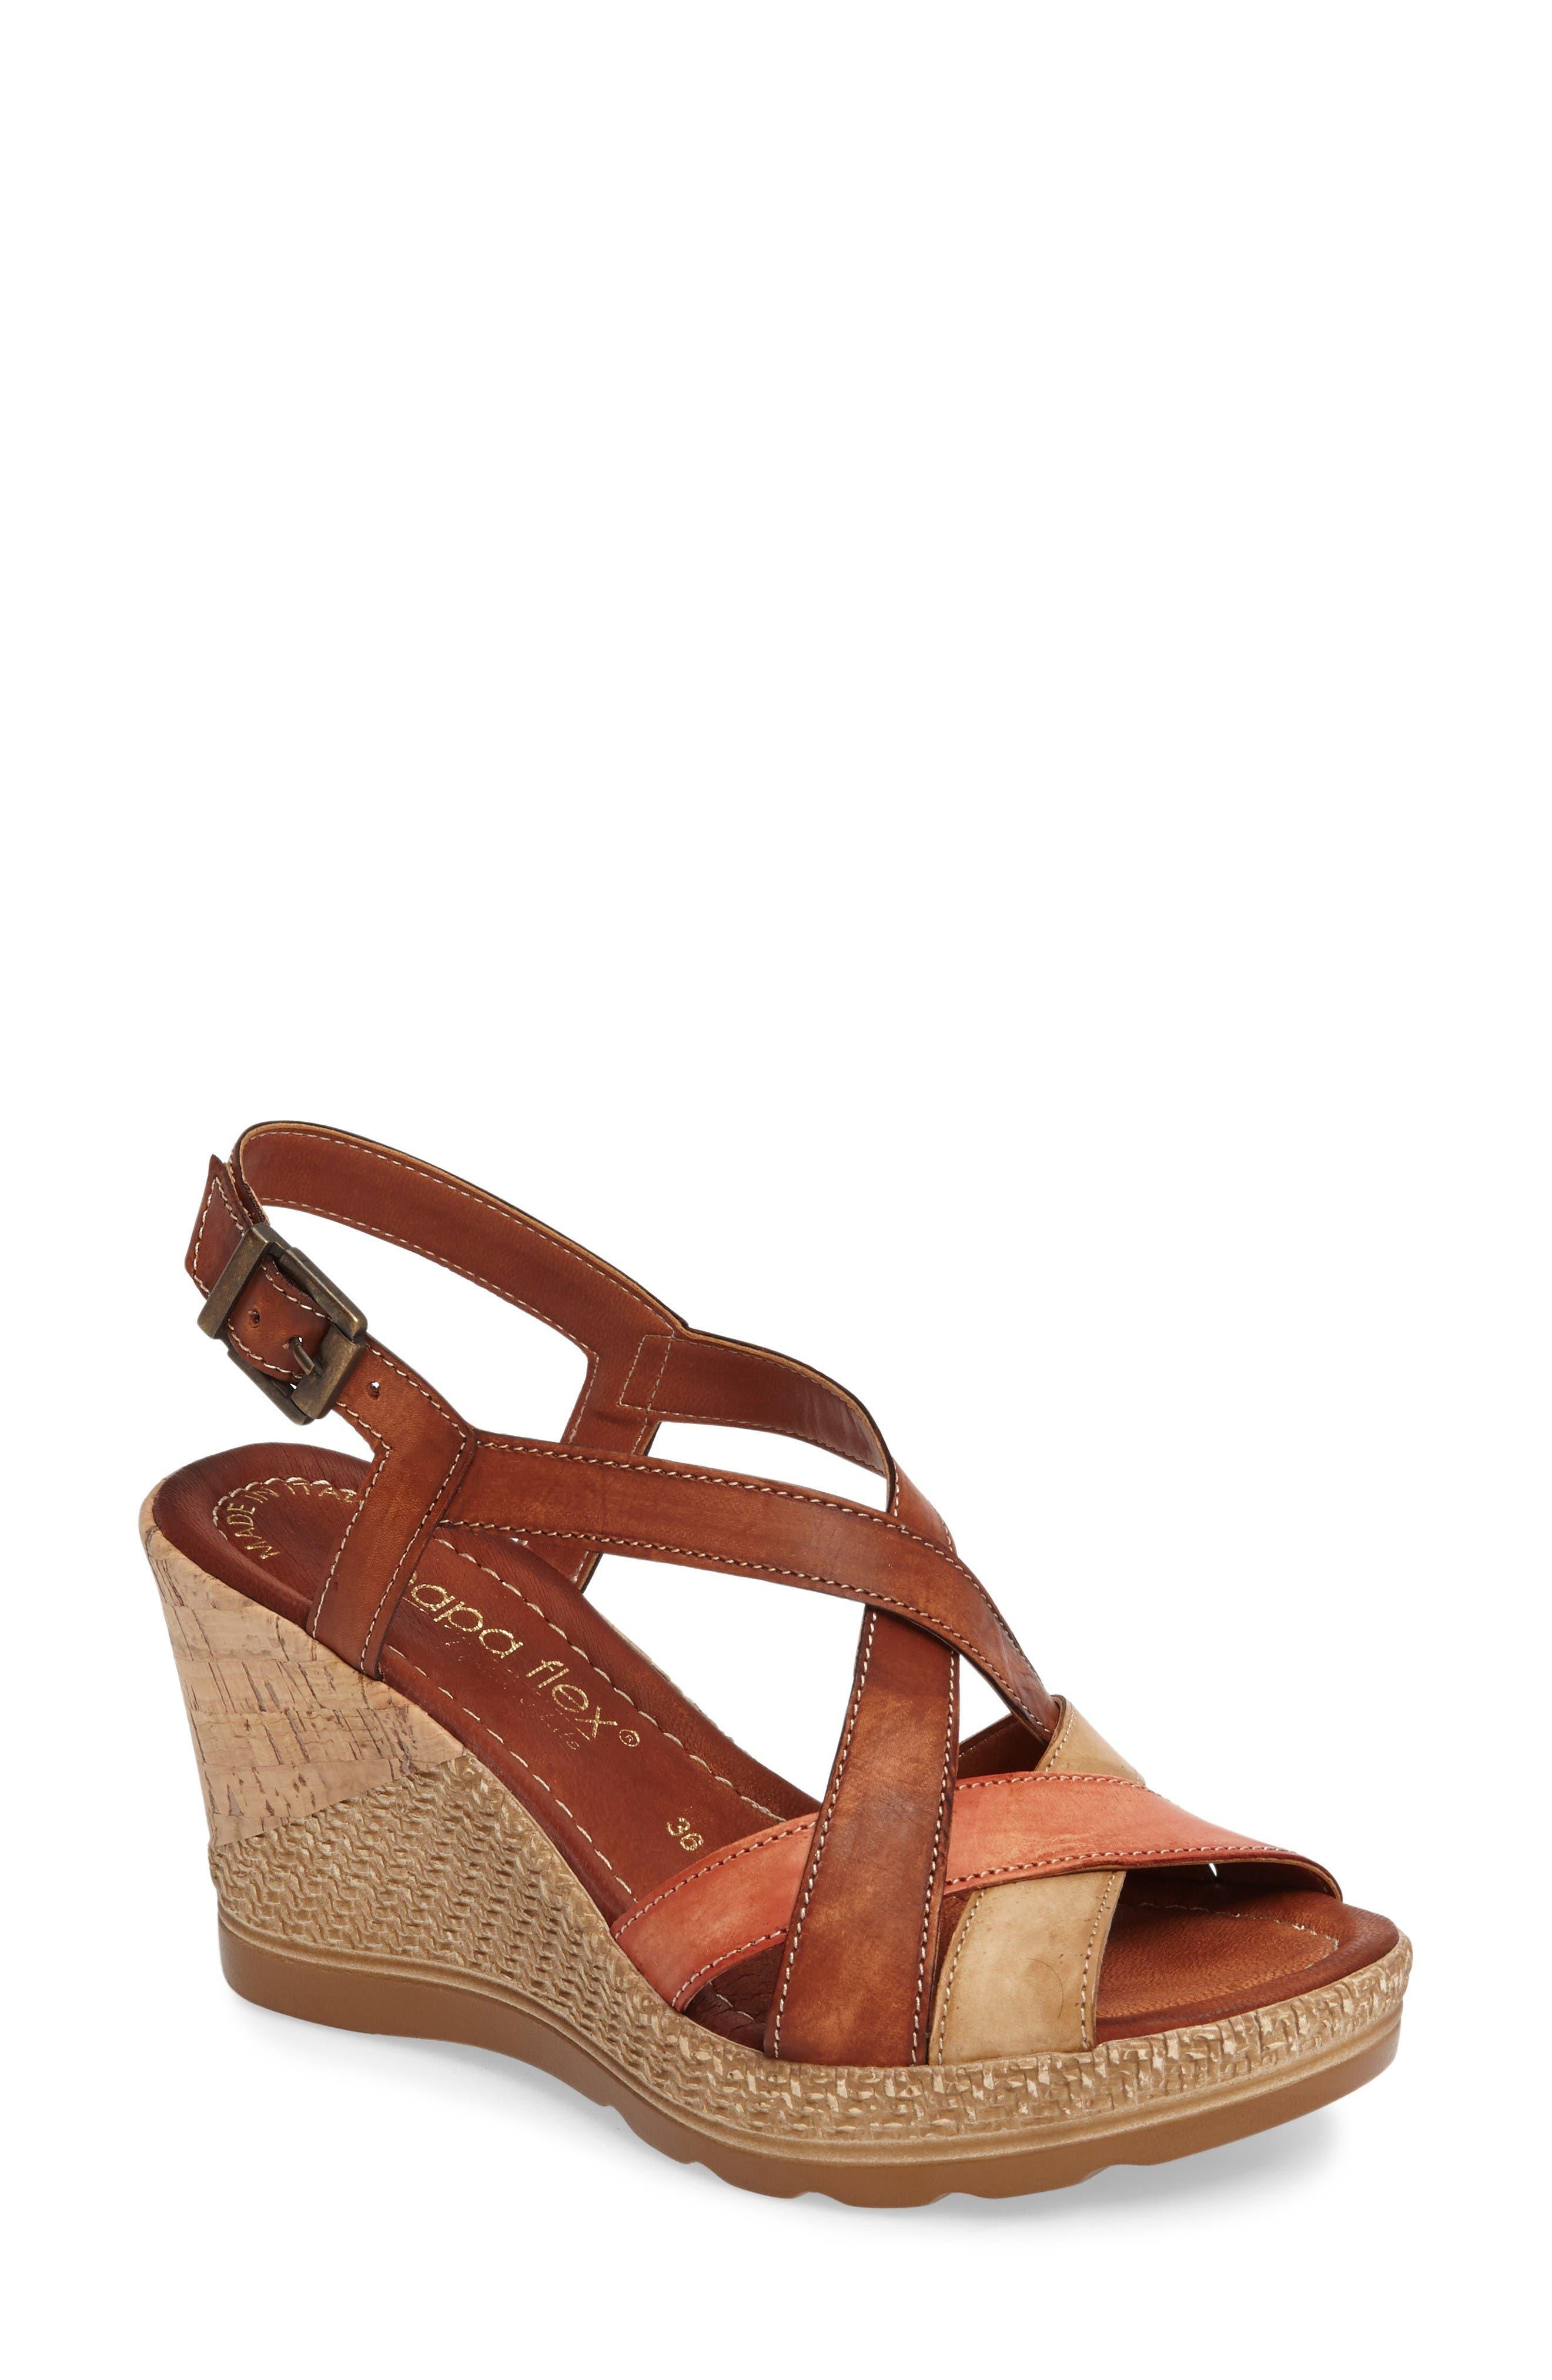 Alternate Image 1 Selected - Napa Flex Modena Wedge Sandal (Women)